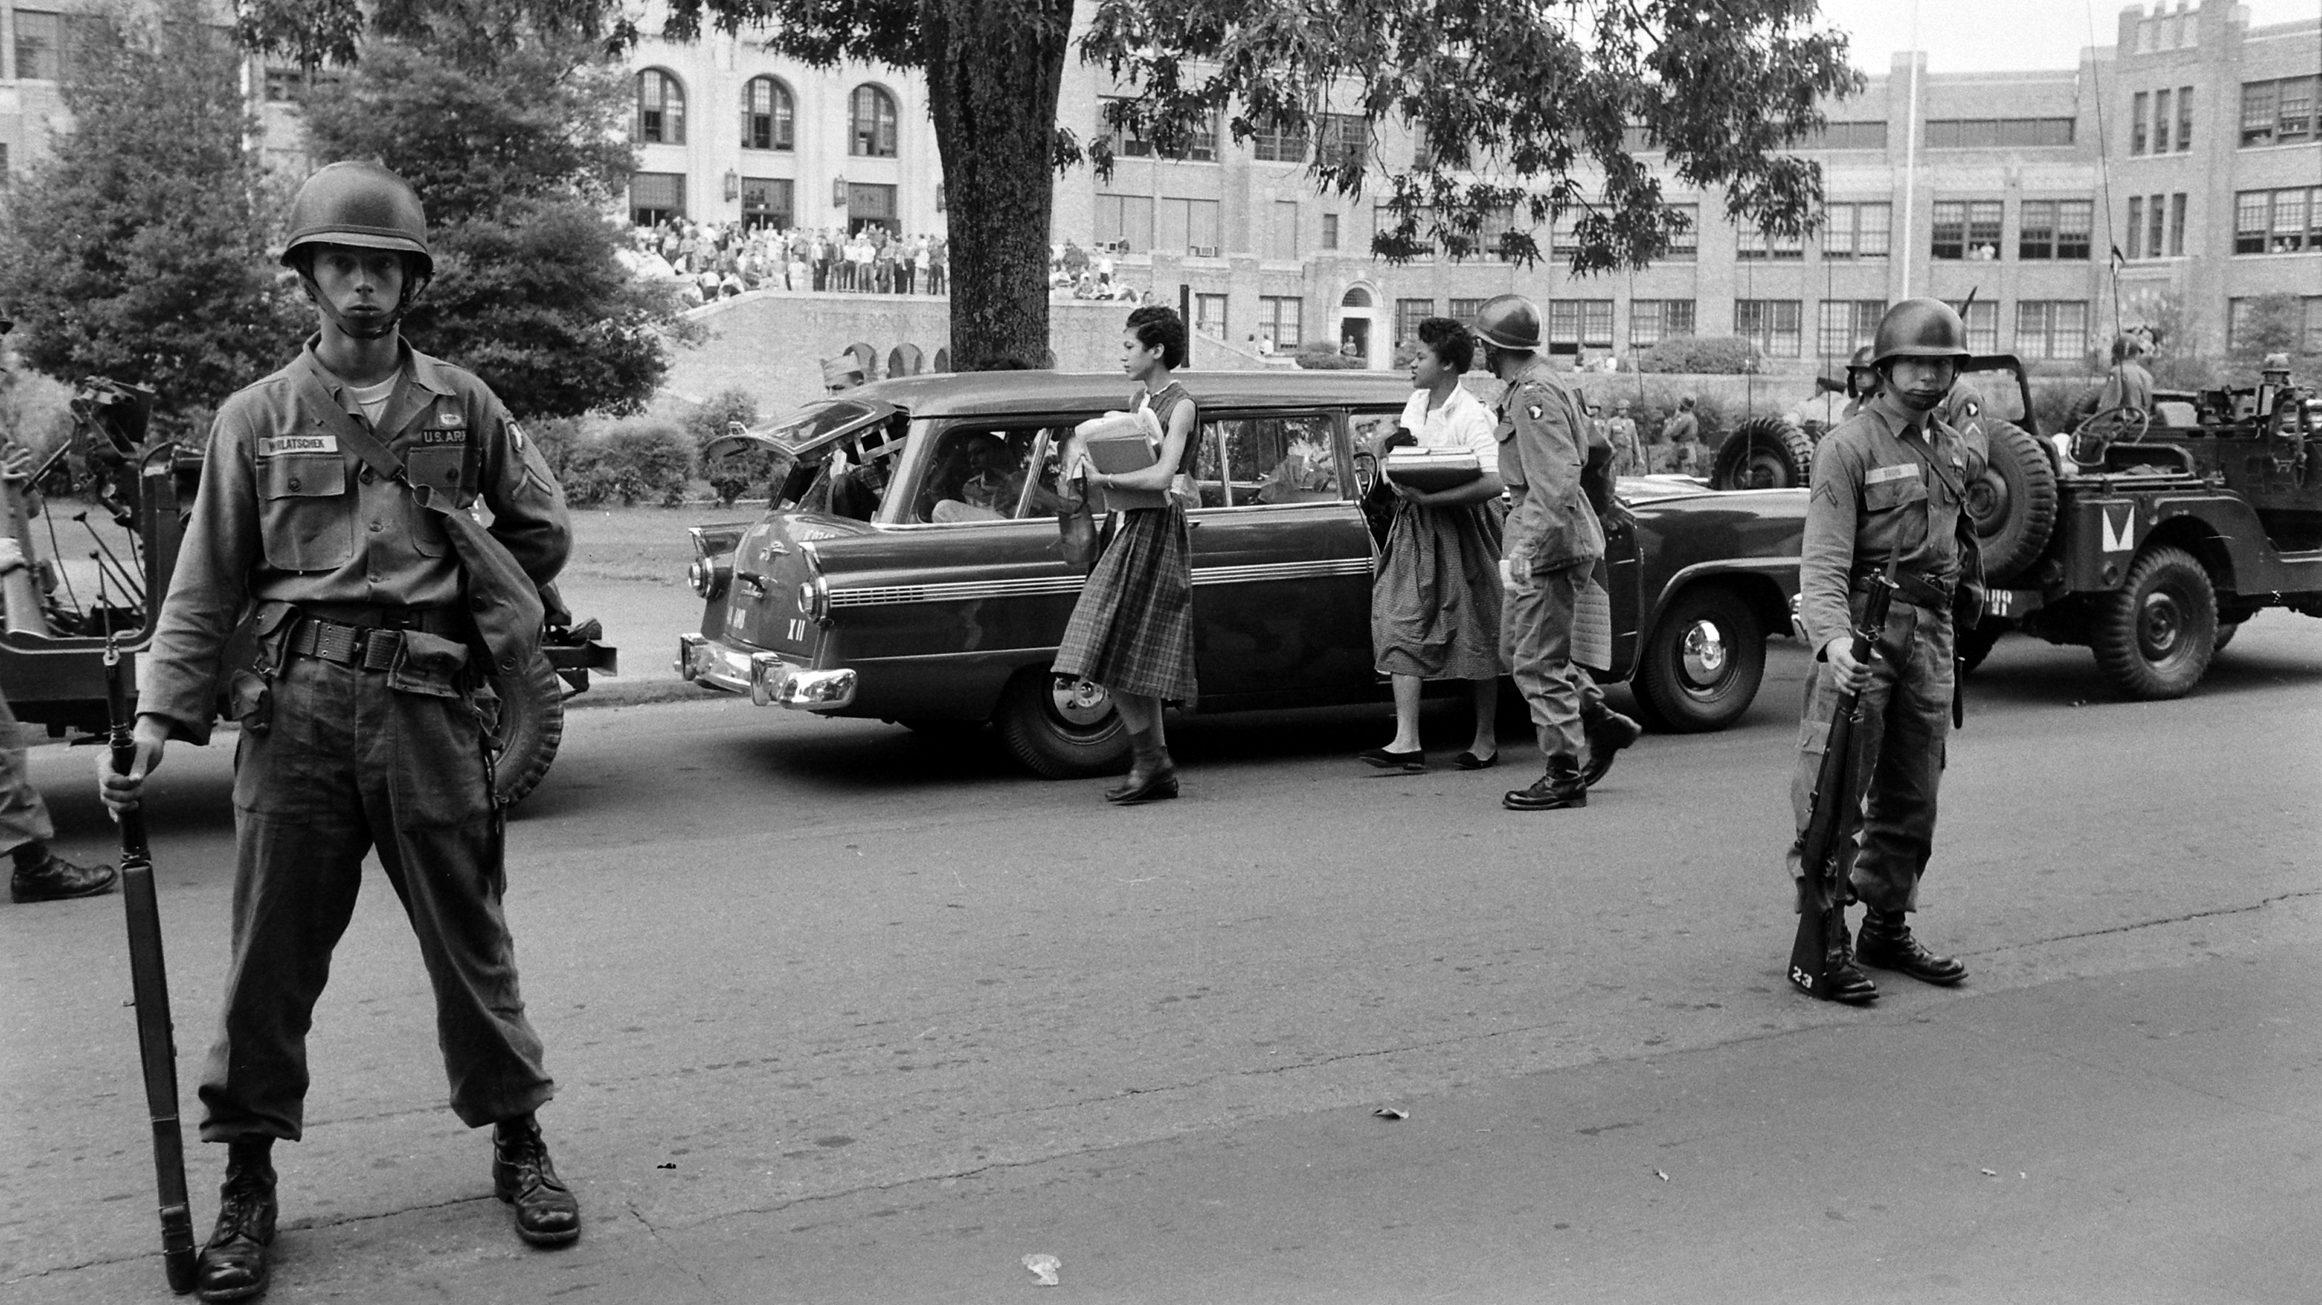 The Arkansas National Guard escorts Carlotta Walls LaNier and a fellow member of the Little Rock Nine on the grounds of Little Rock Central High School, September 1957.